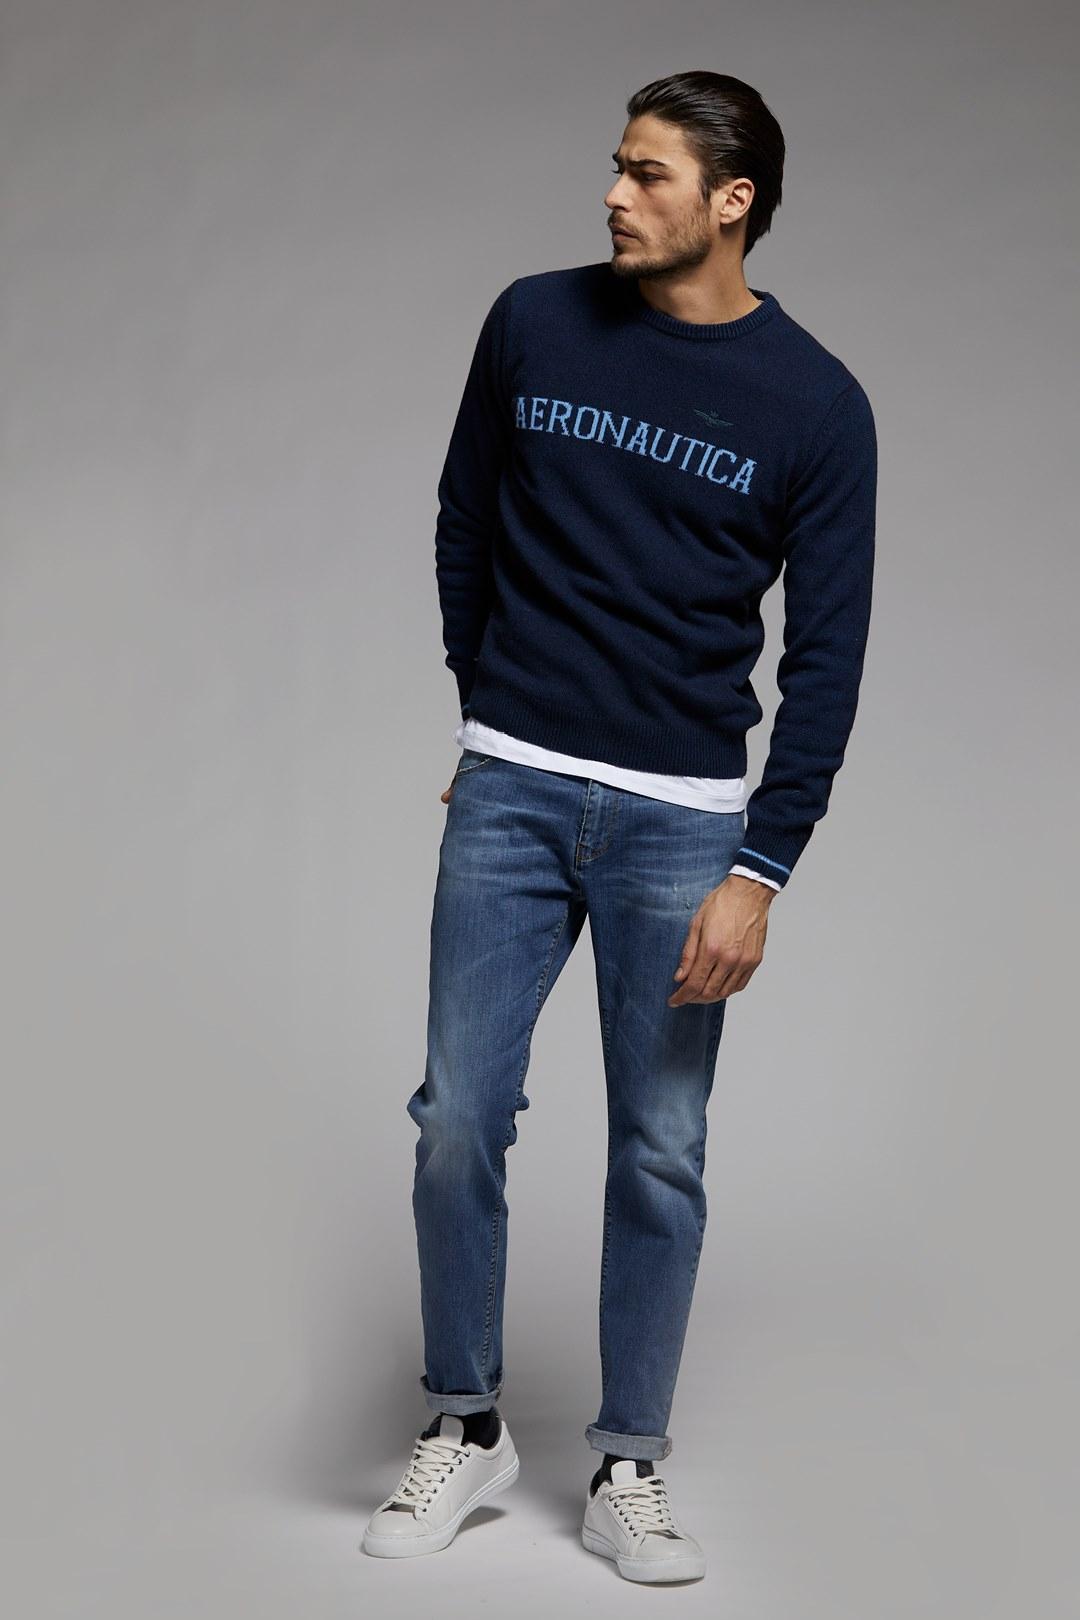 5-pockets denim trousers                 4